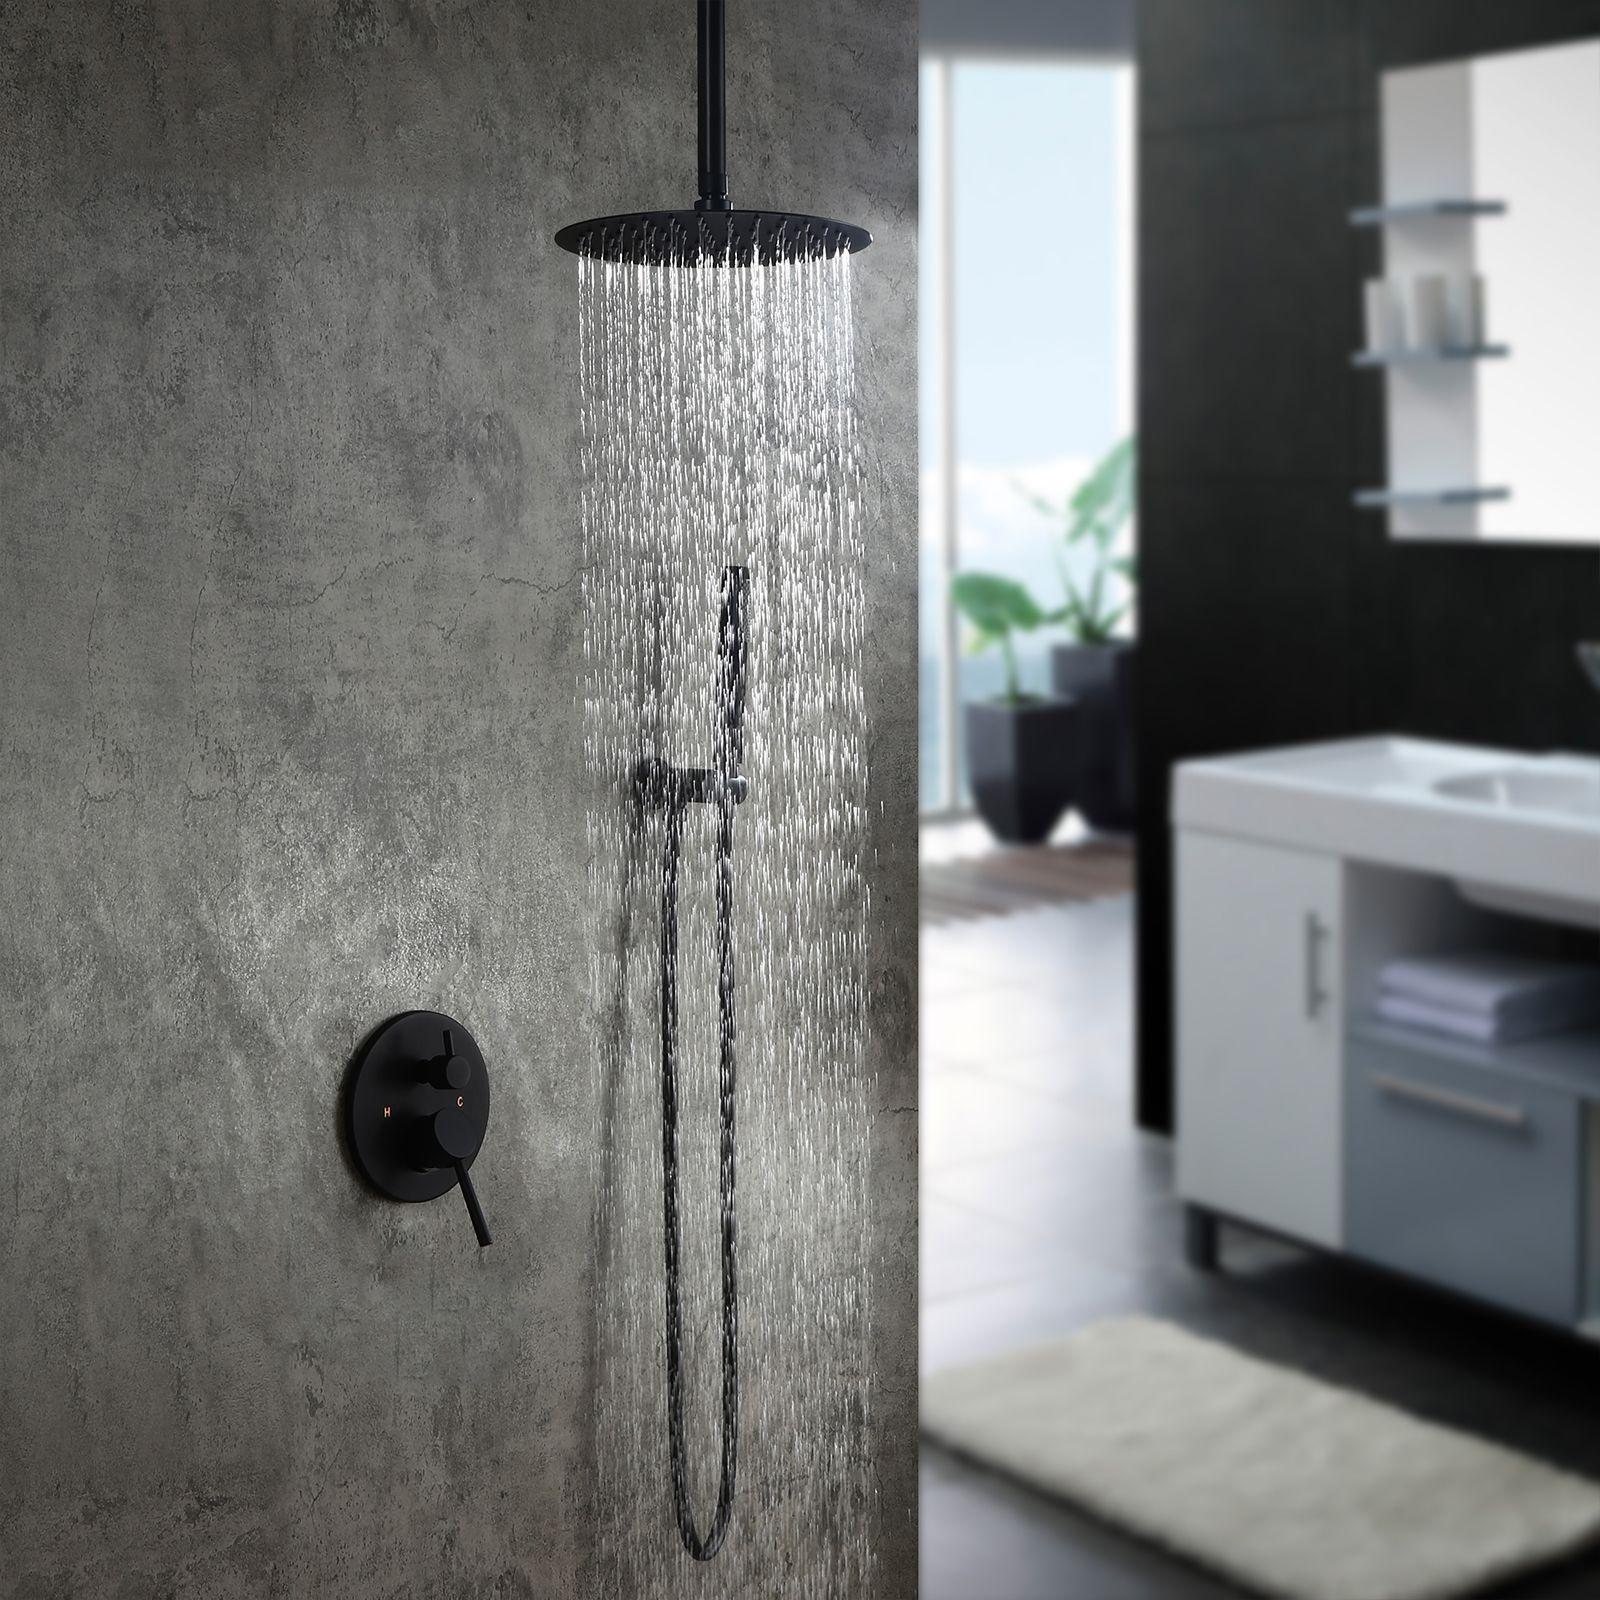 Round Rain Shower Head Shower 10 Combo System With Handheld Shower Matte Black In 2021 Rain Shower System Wall Mount Rain Shower Shower Systems [ 1600 x 1600 Pixel ]